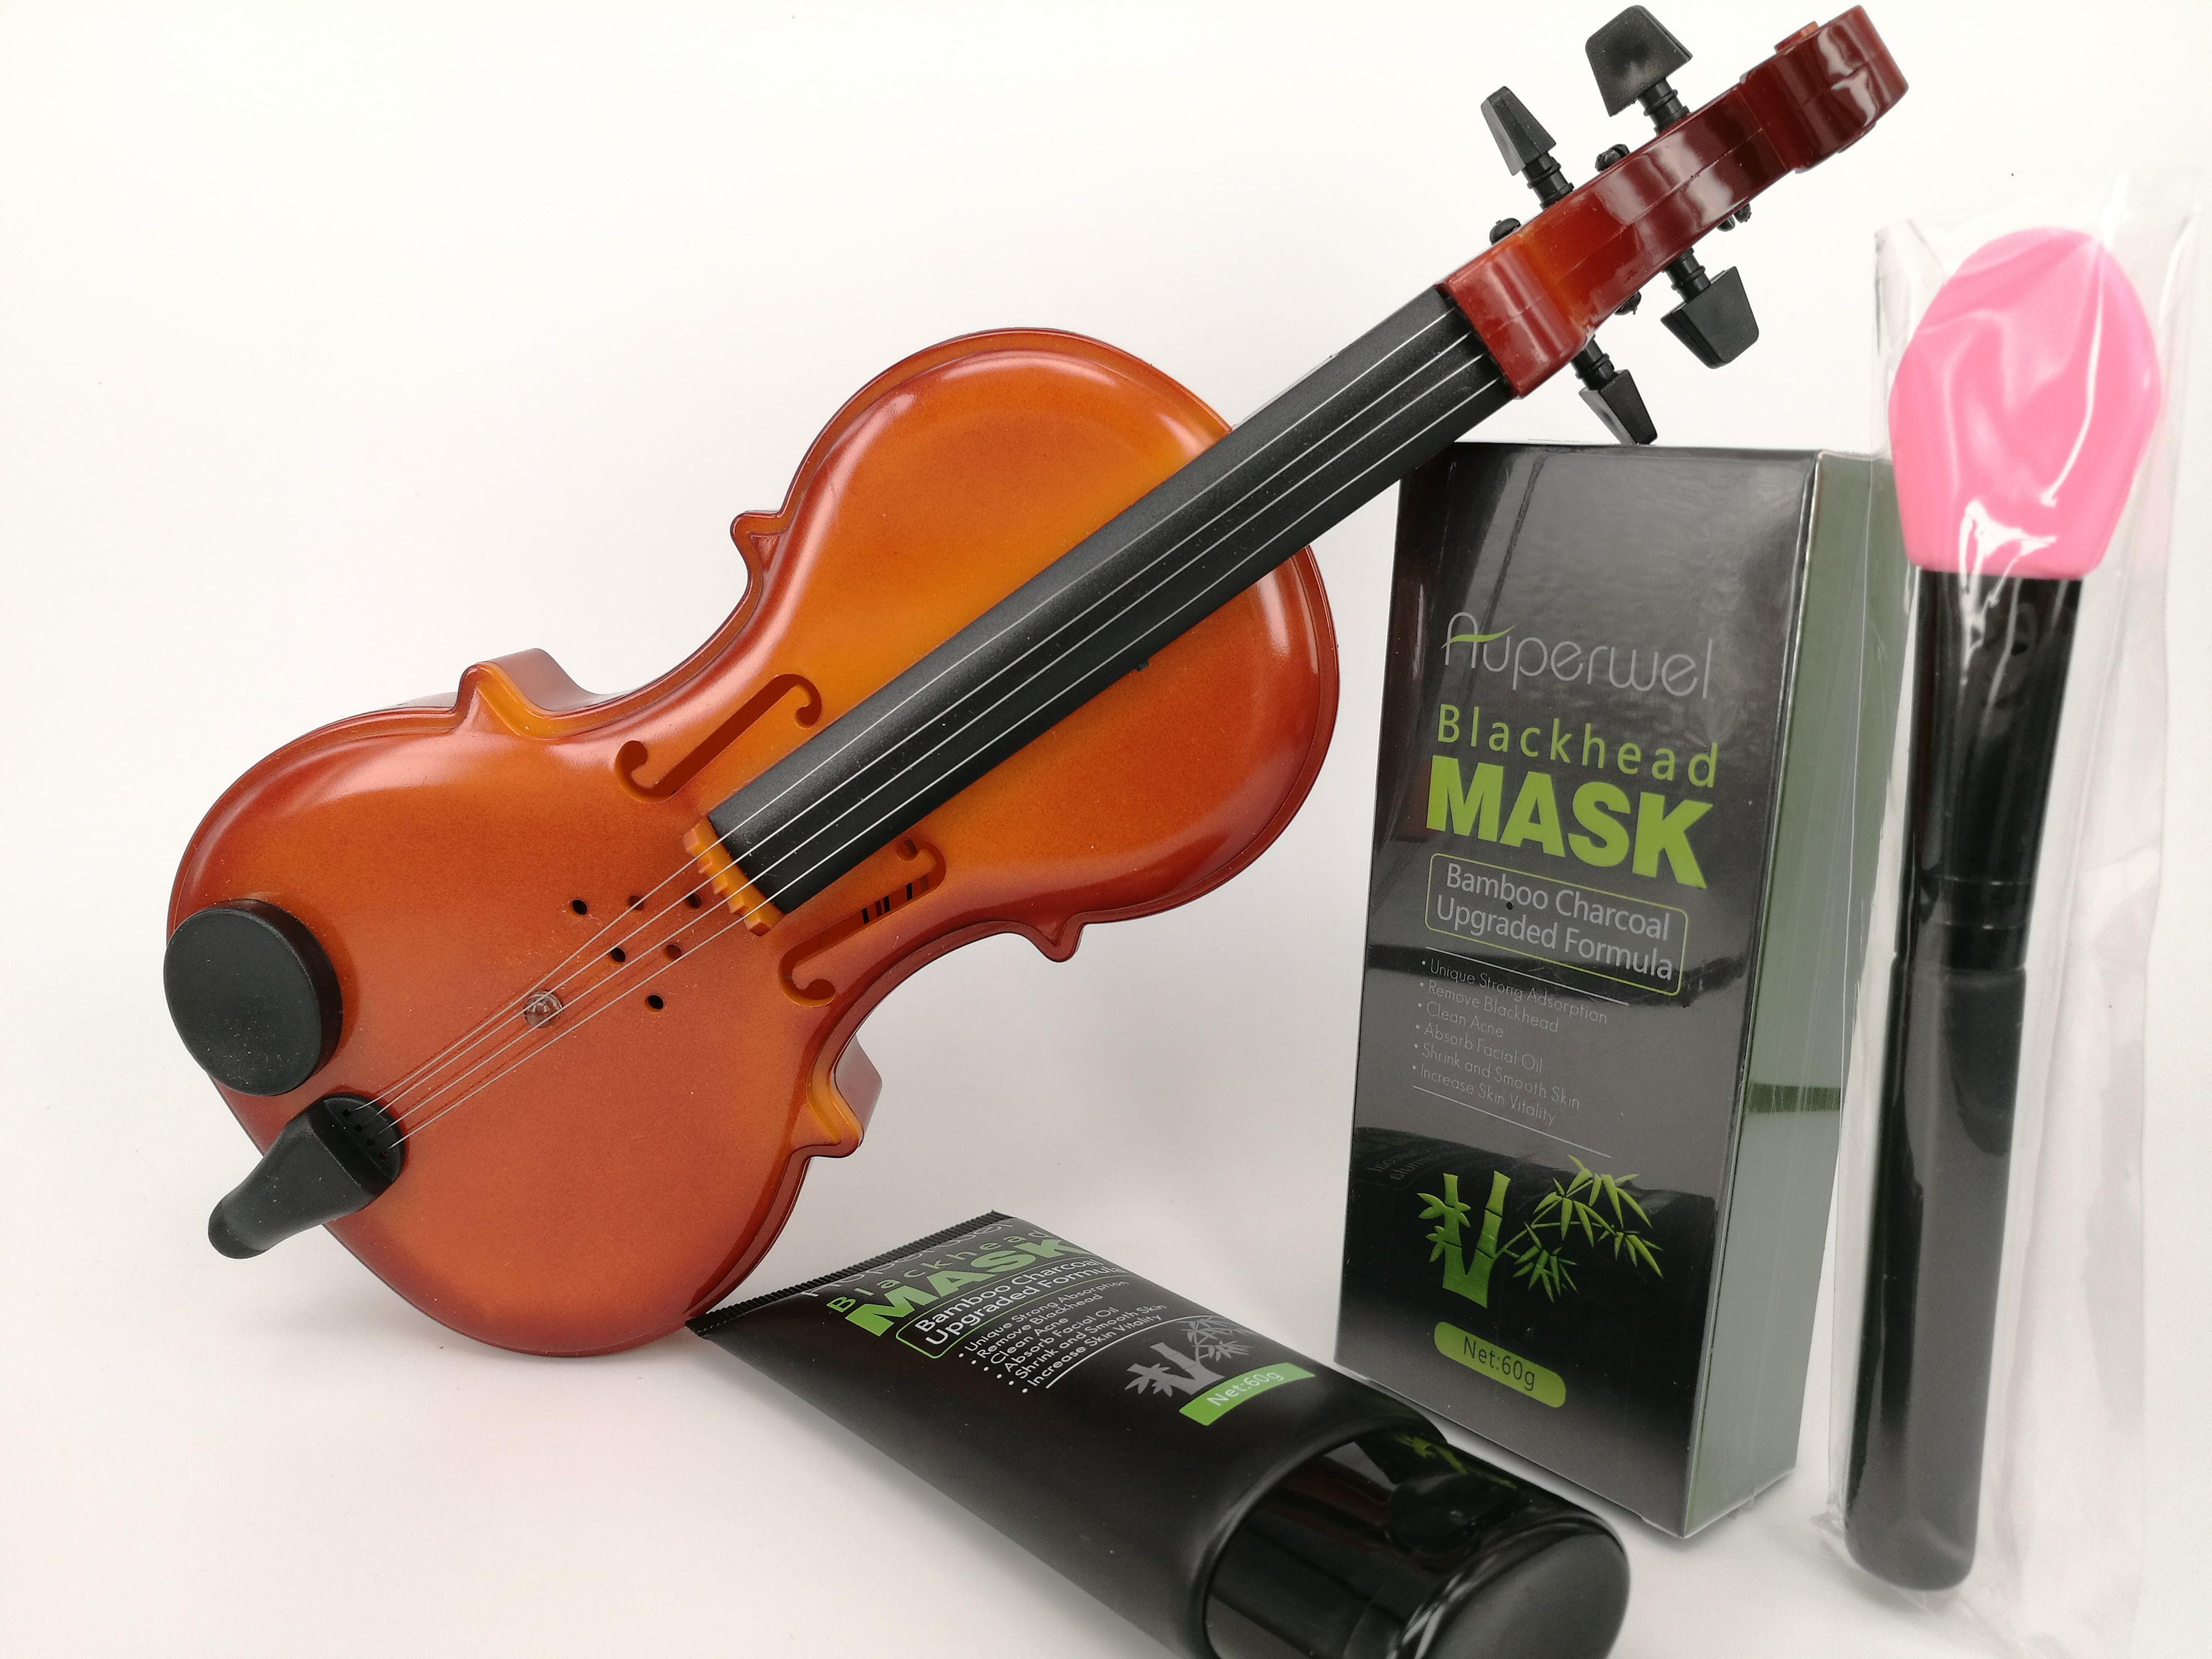 Pin on auperwel black mask blackhead remover mask amazon